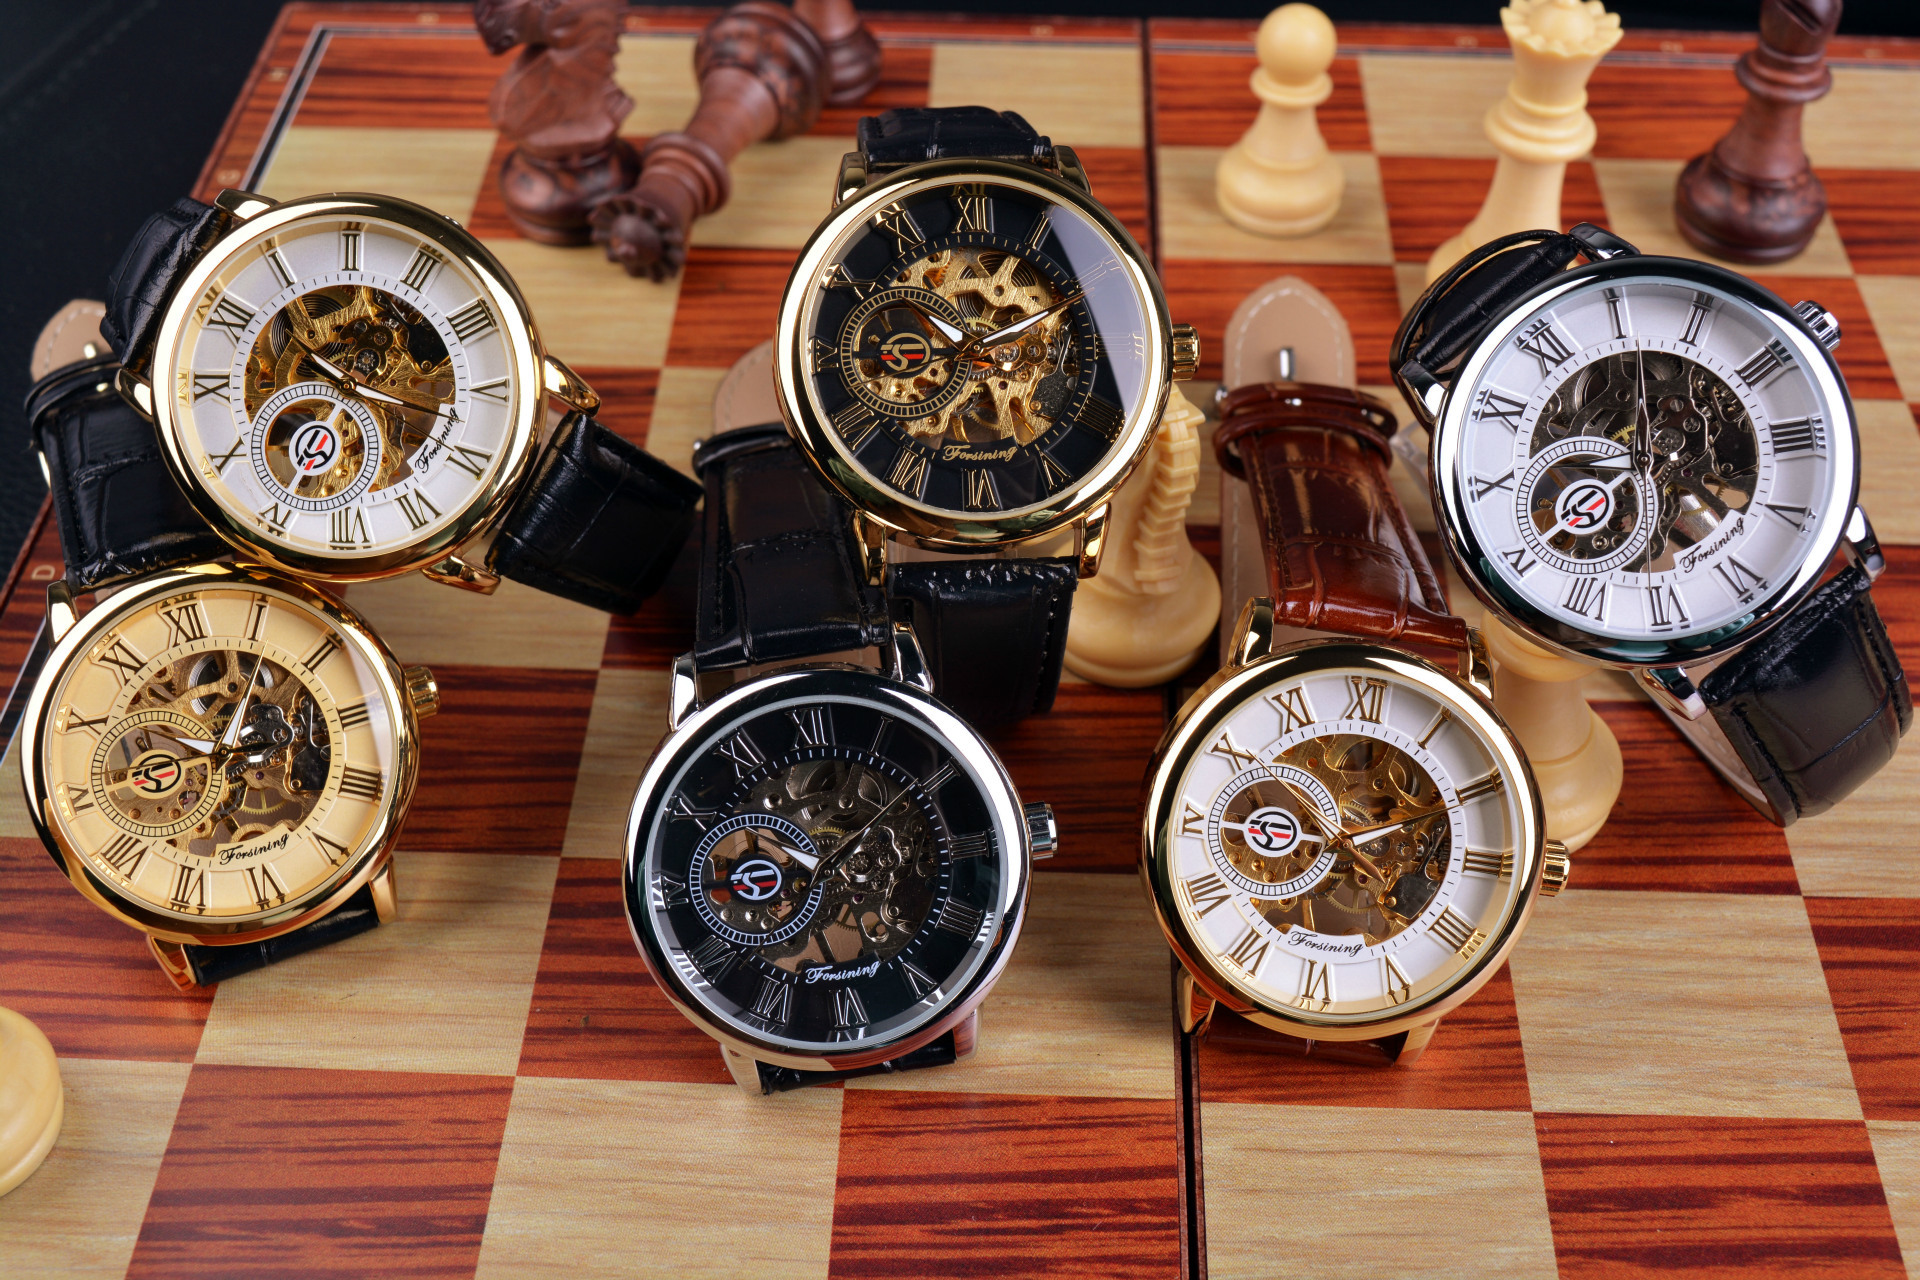 Forsining 3d Logo Design Hollow Engraving Black Gold Case Leather Skeleton Mechanical Watches Men Luxury Brand Heren Horloge 13